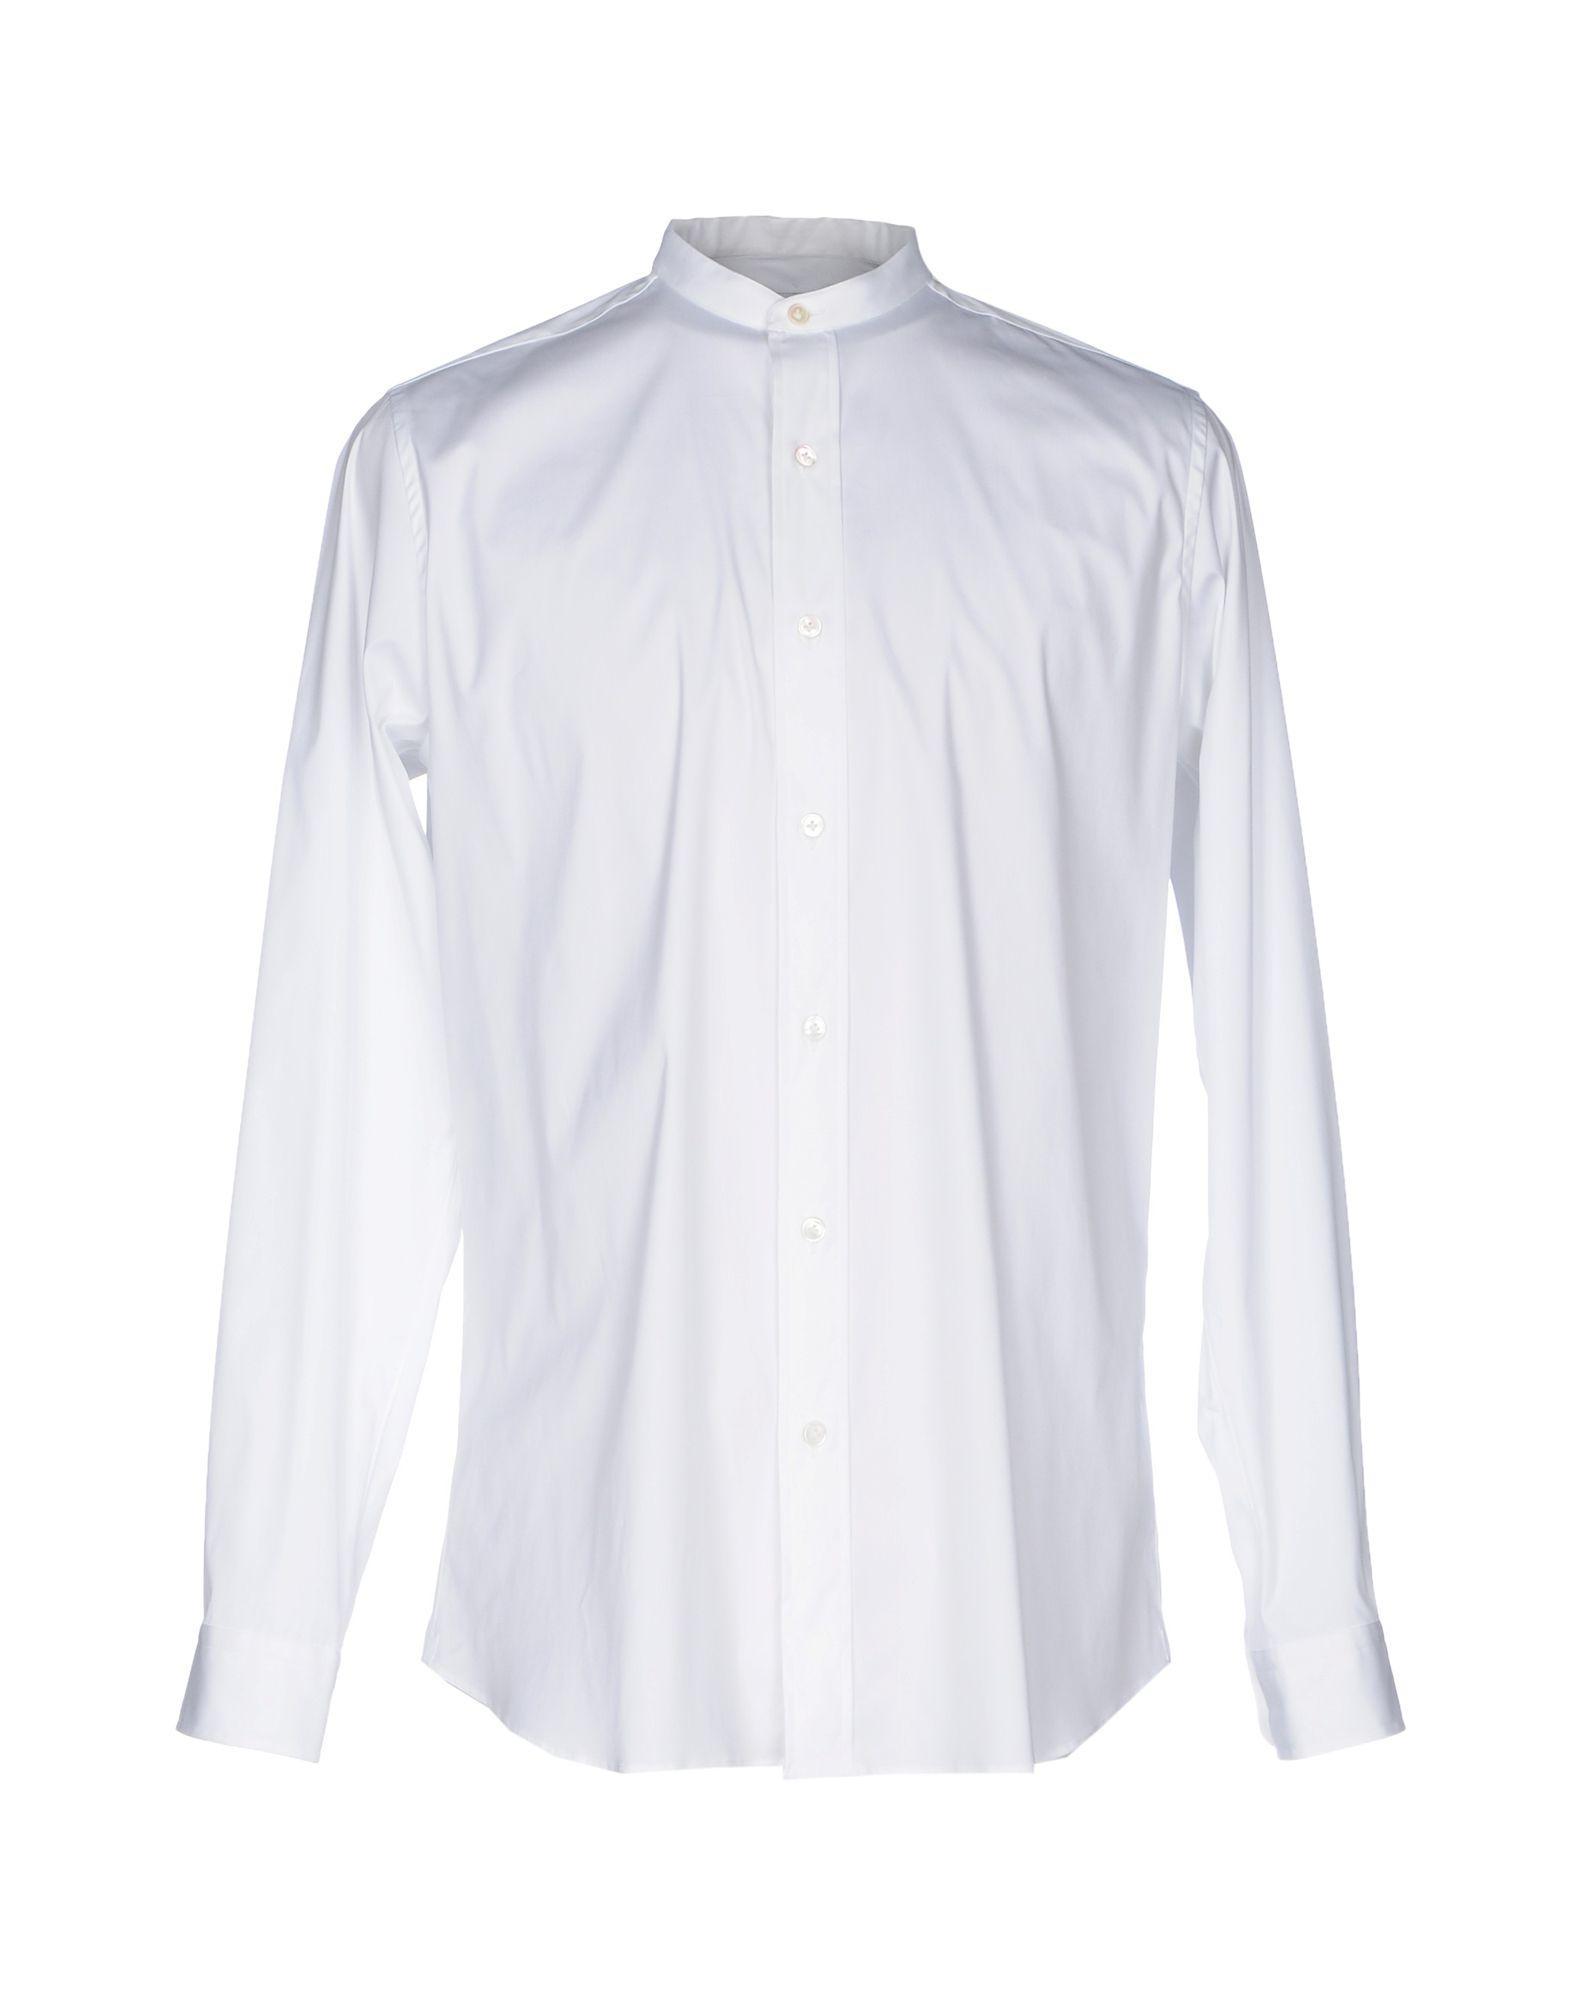 Ports 1961 Shirt in White for Men